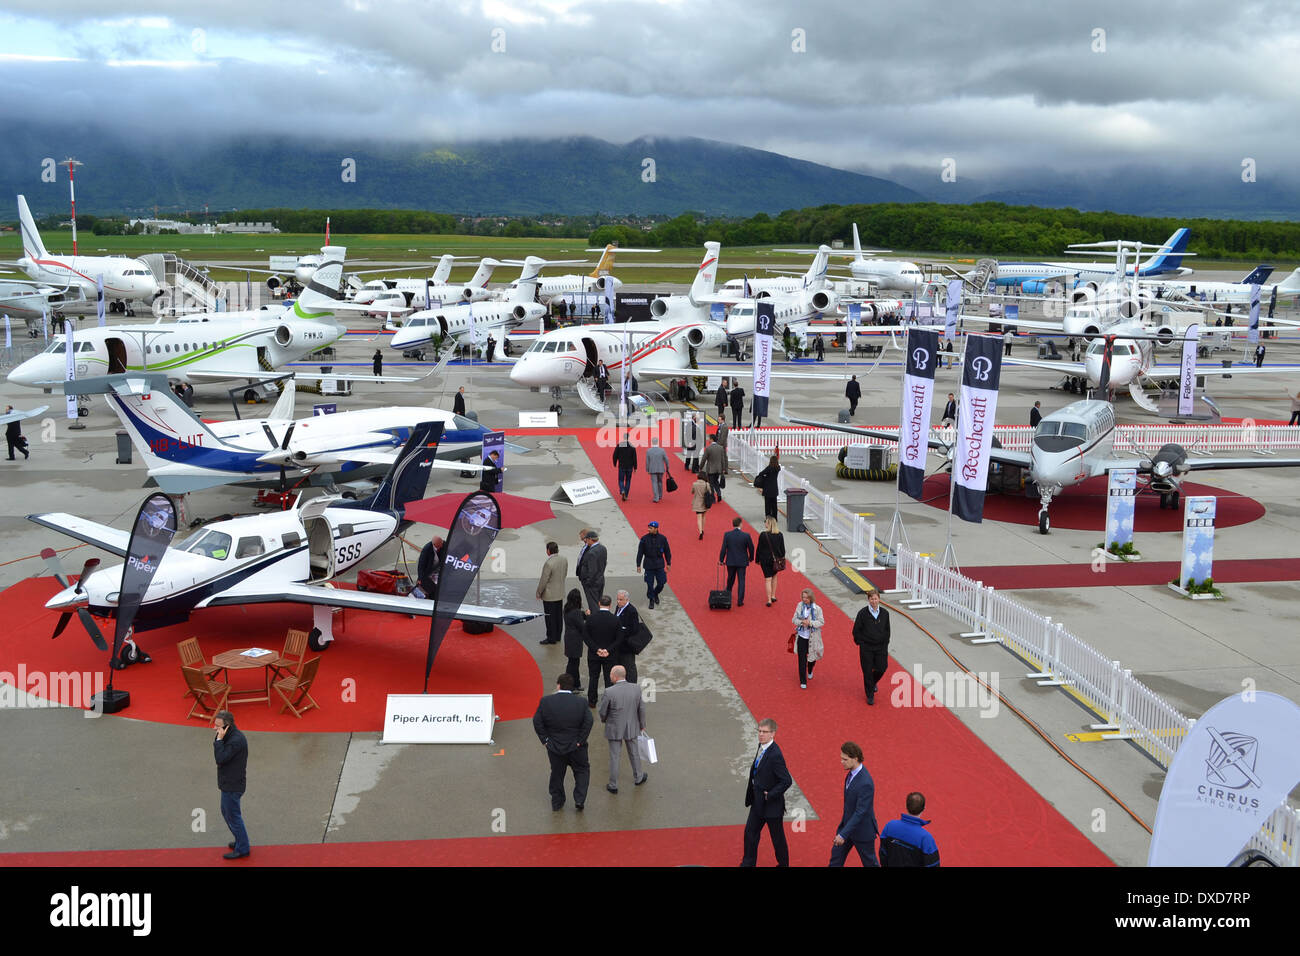 Aircraft at the 2013 Ebace exhibition at Geneva International Airport, Switzerland. Stock Photo